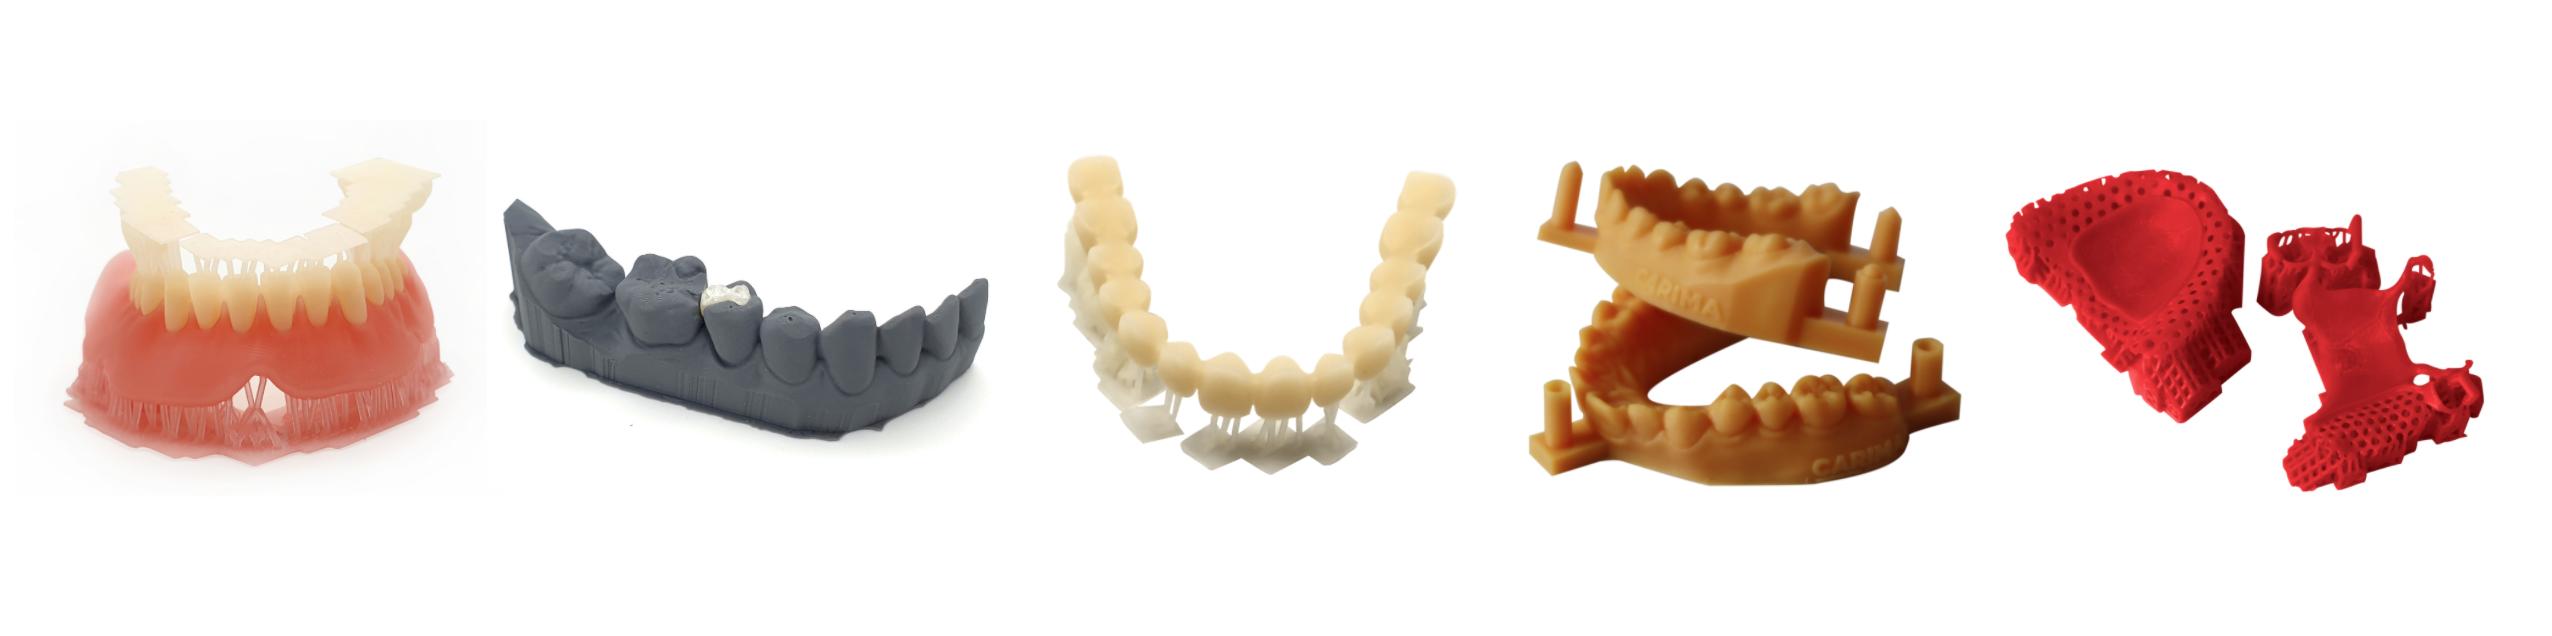 Carima sponsored banner dental resin 3D print examples